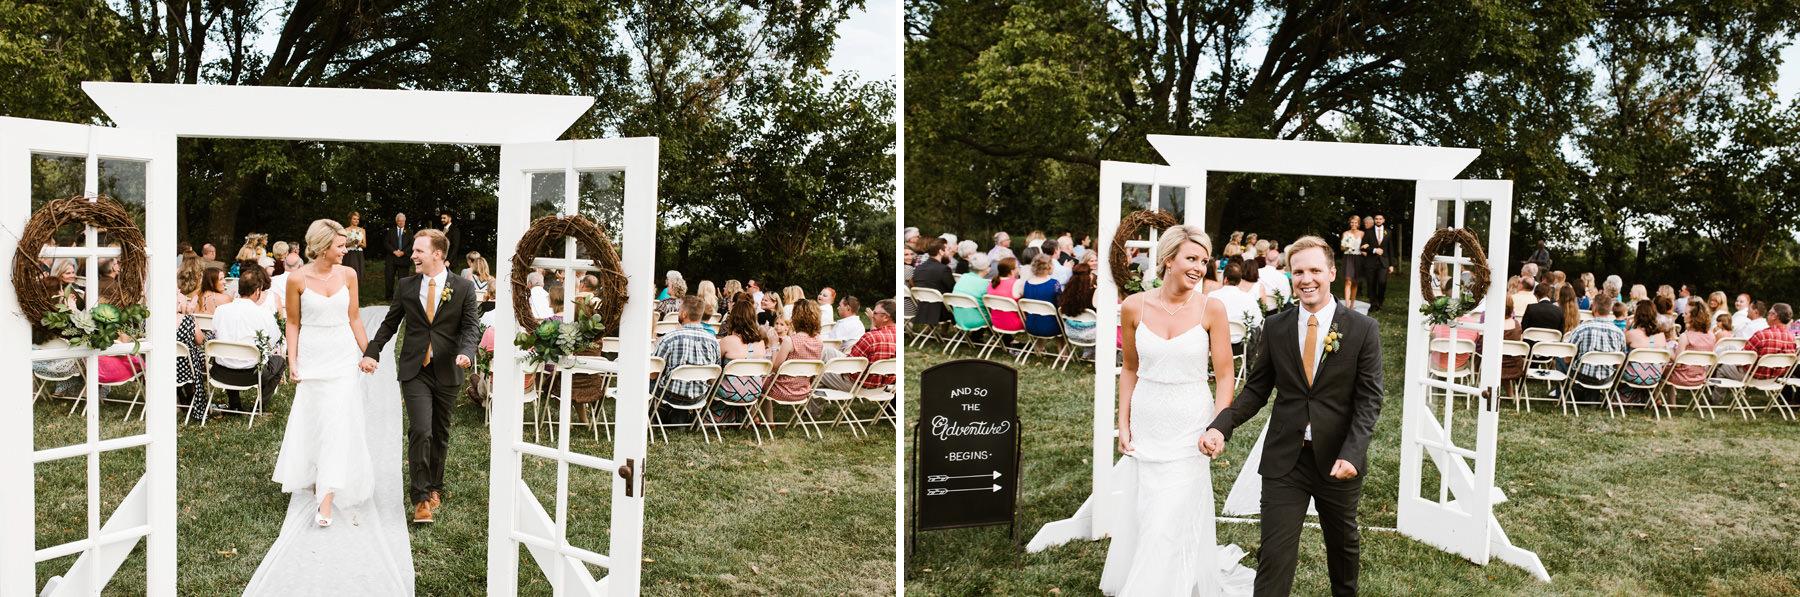 Alldredge Orchard Kansas City_Kindling Wedding Photography BLOG 47.JPG